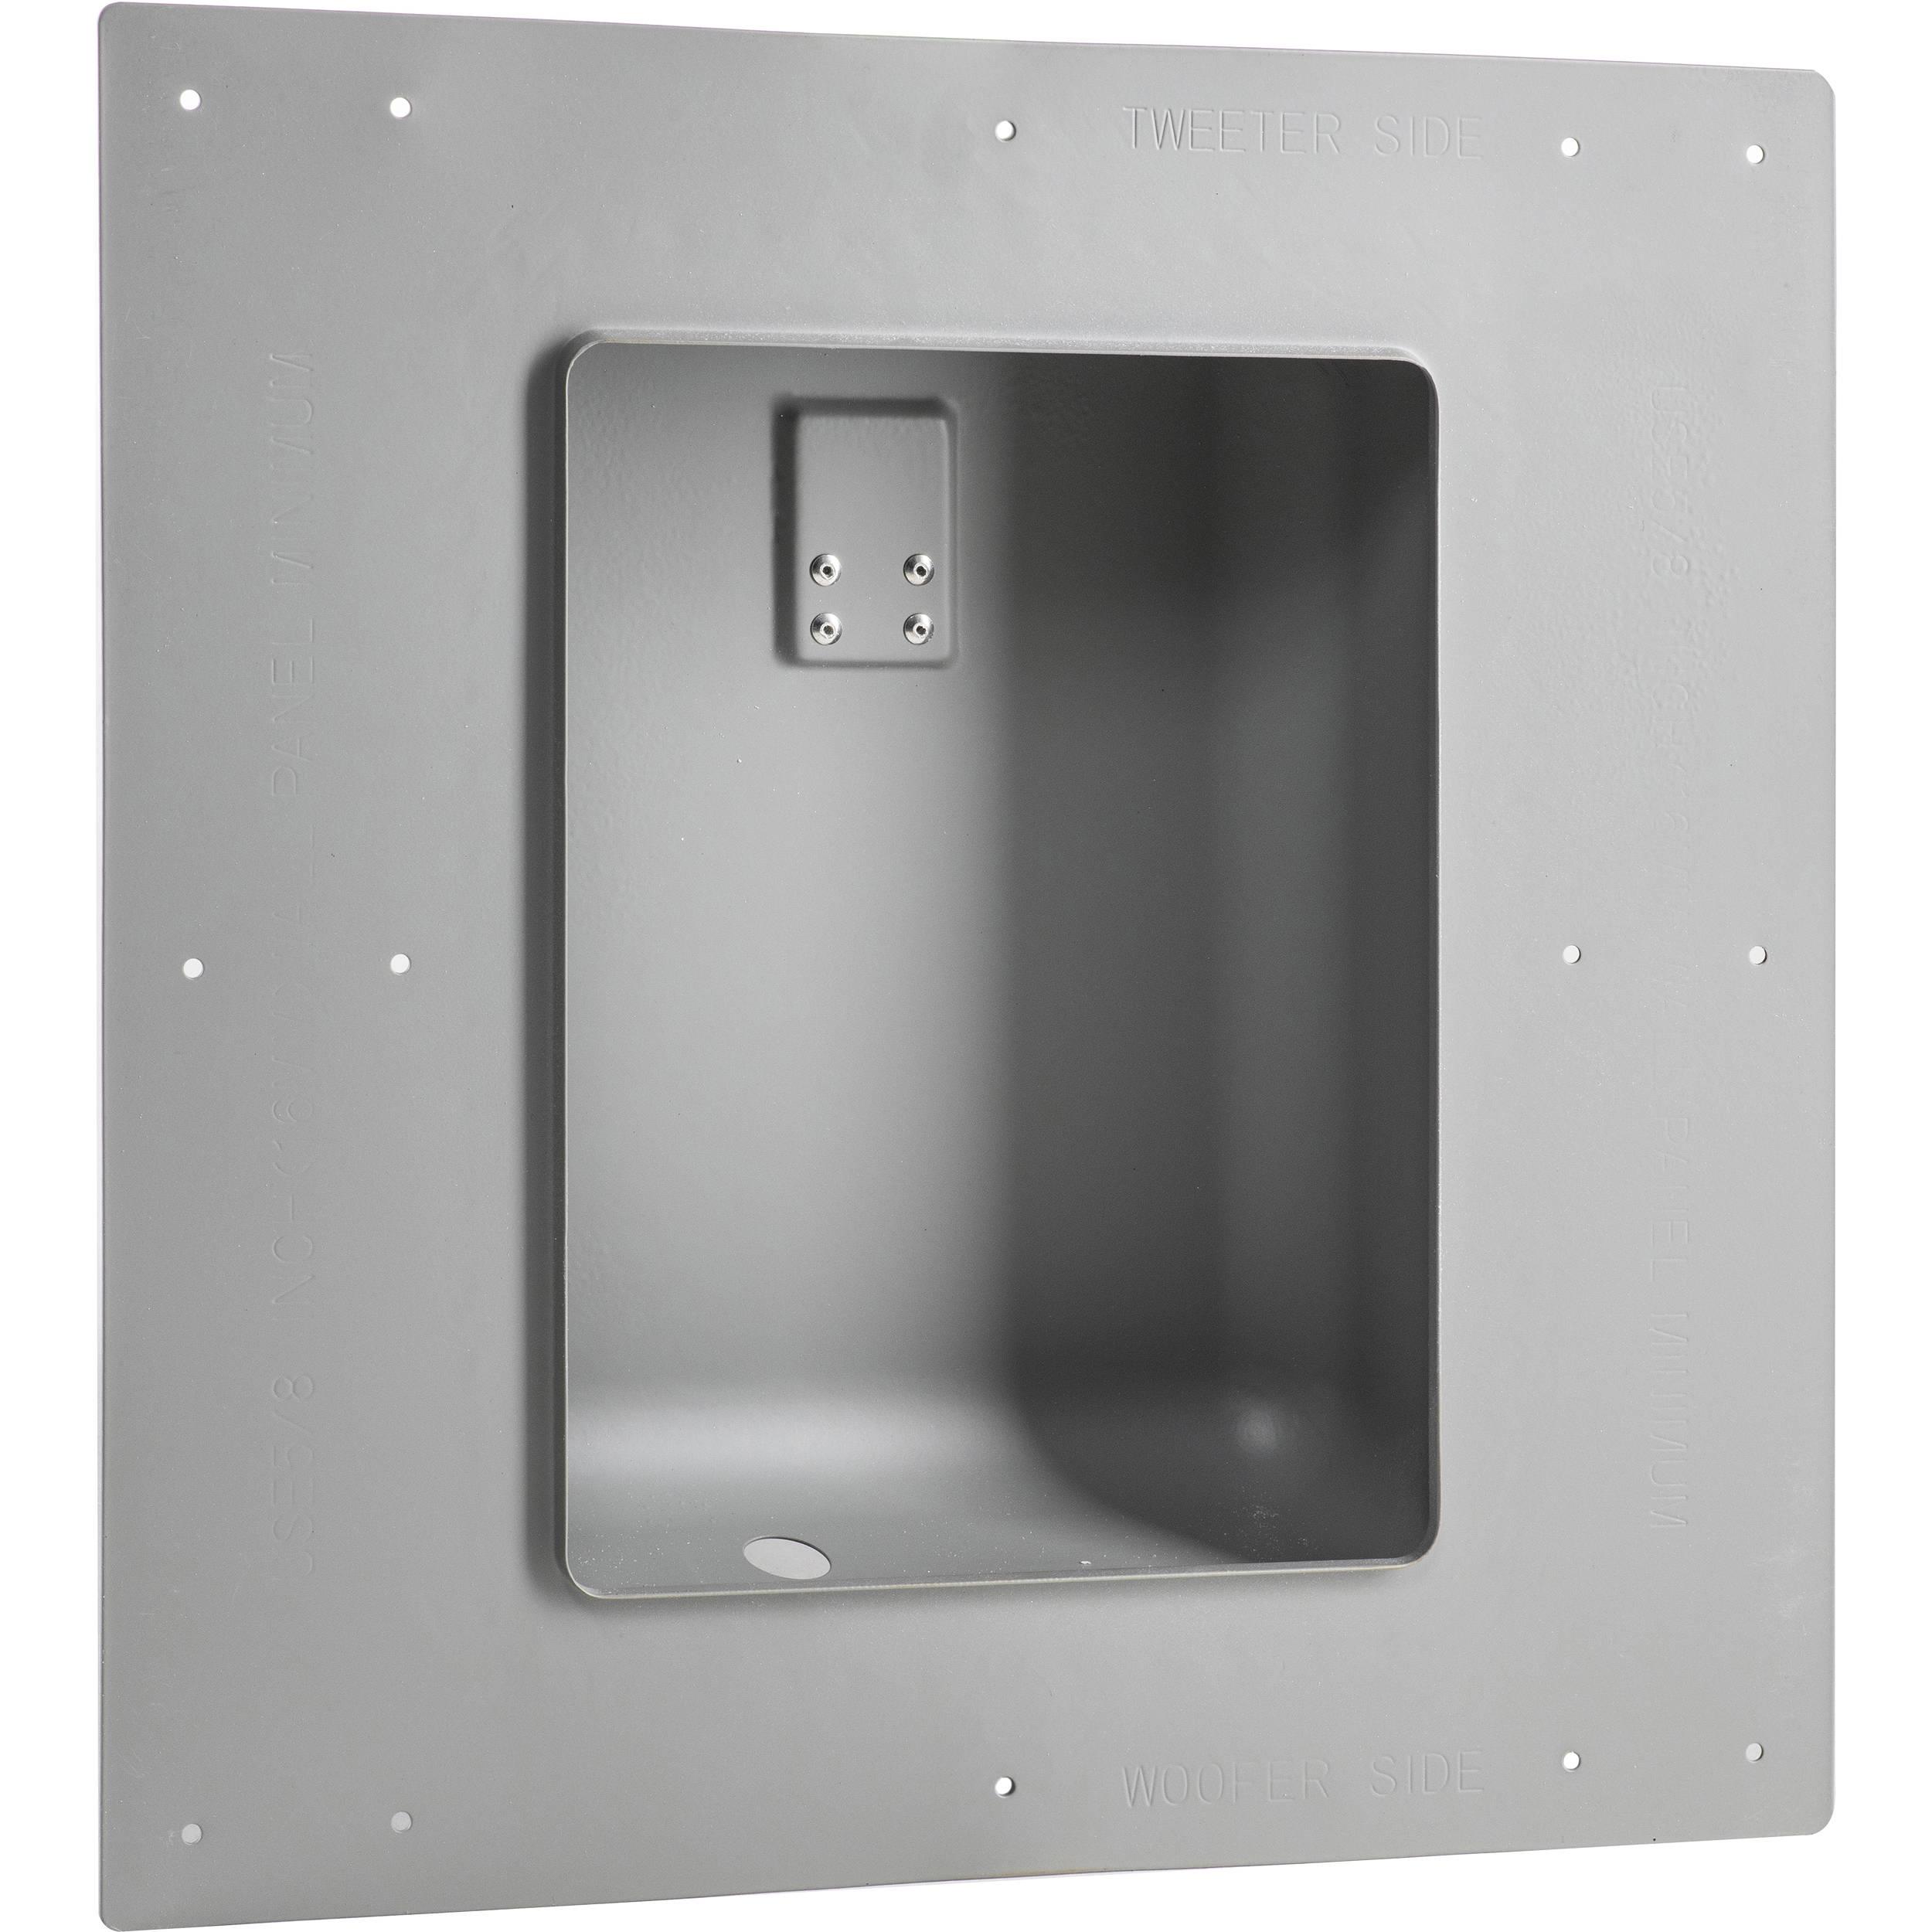 JBL Fire & Plenum Rated Steel Backbox for Studio 2 8IC Speaker